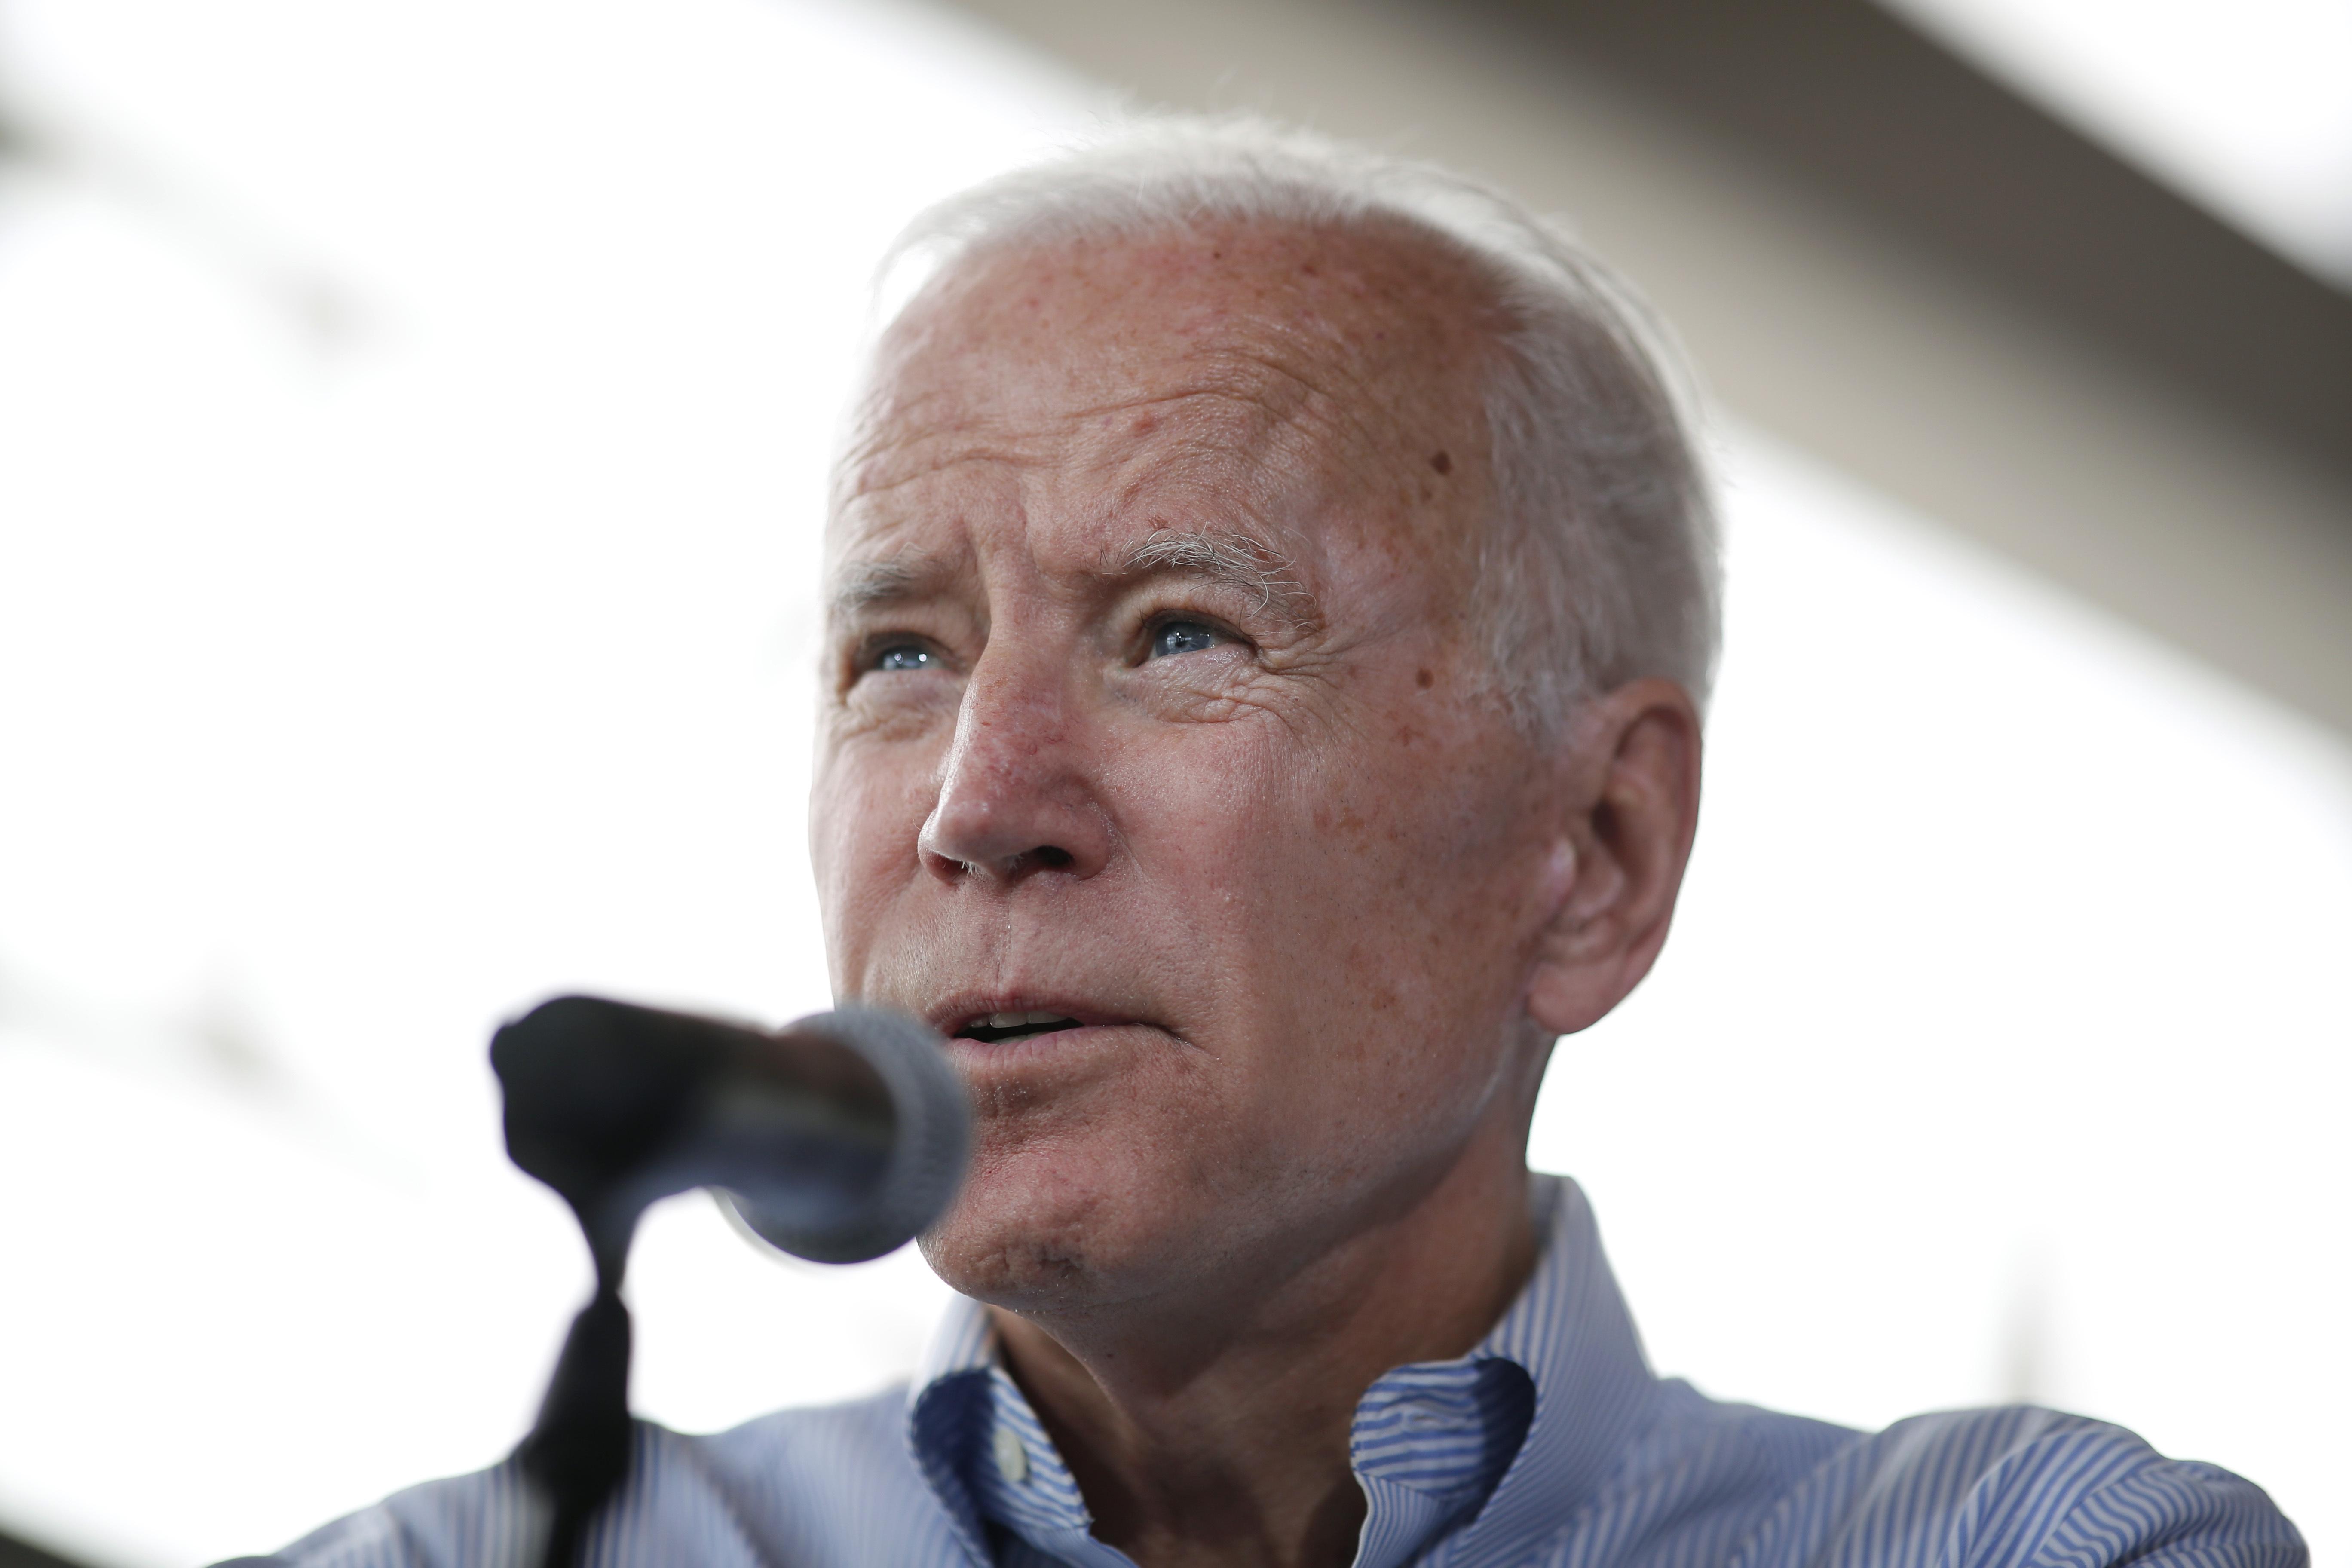 Sleepy Joe Biden Taunt Strikes Chord With Democrats Washington Times